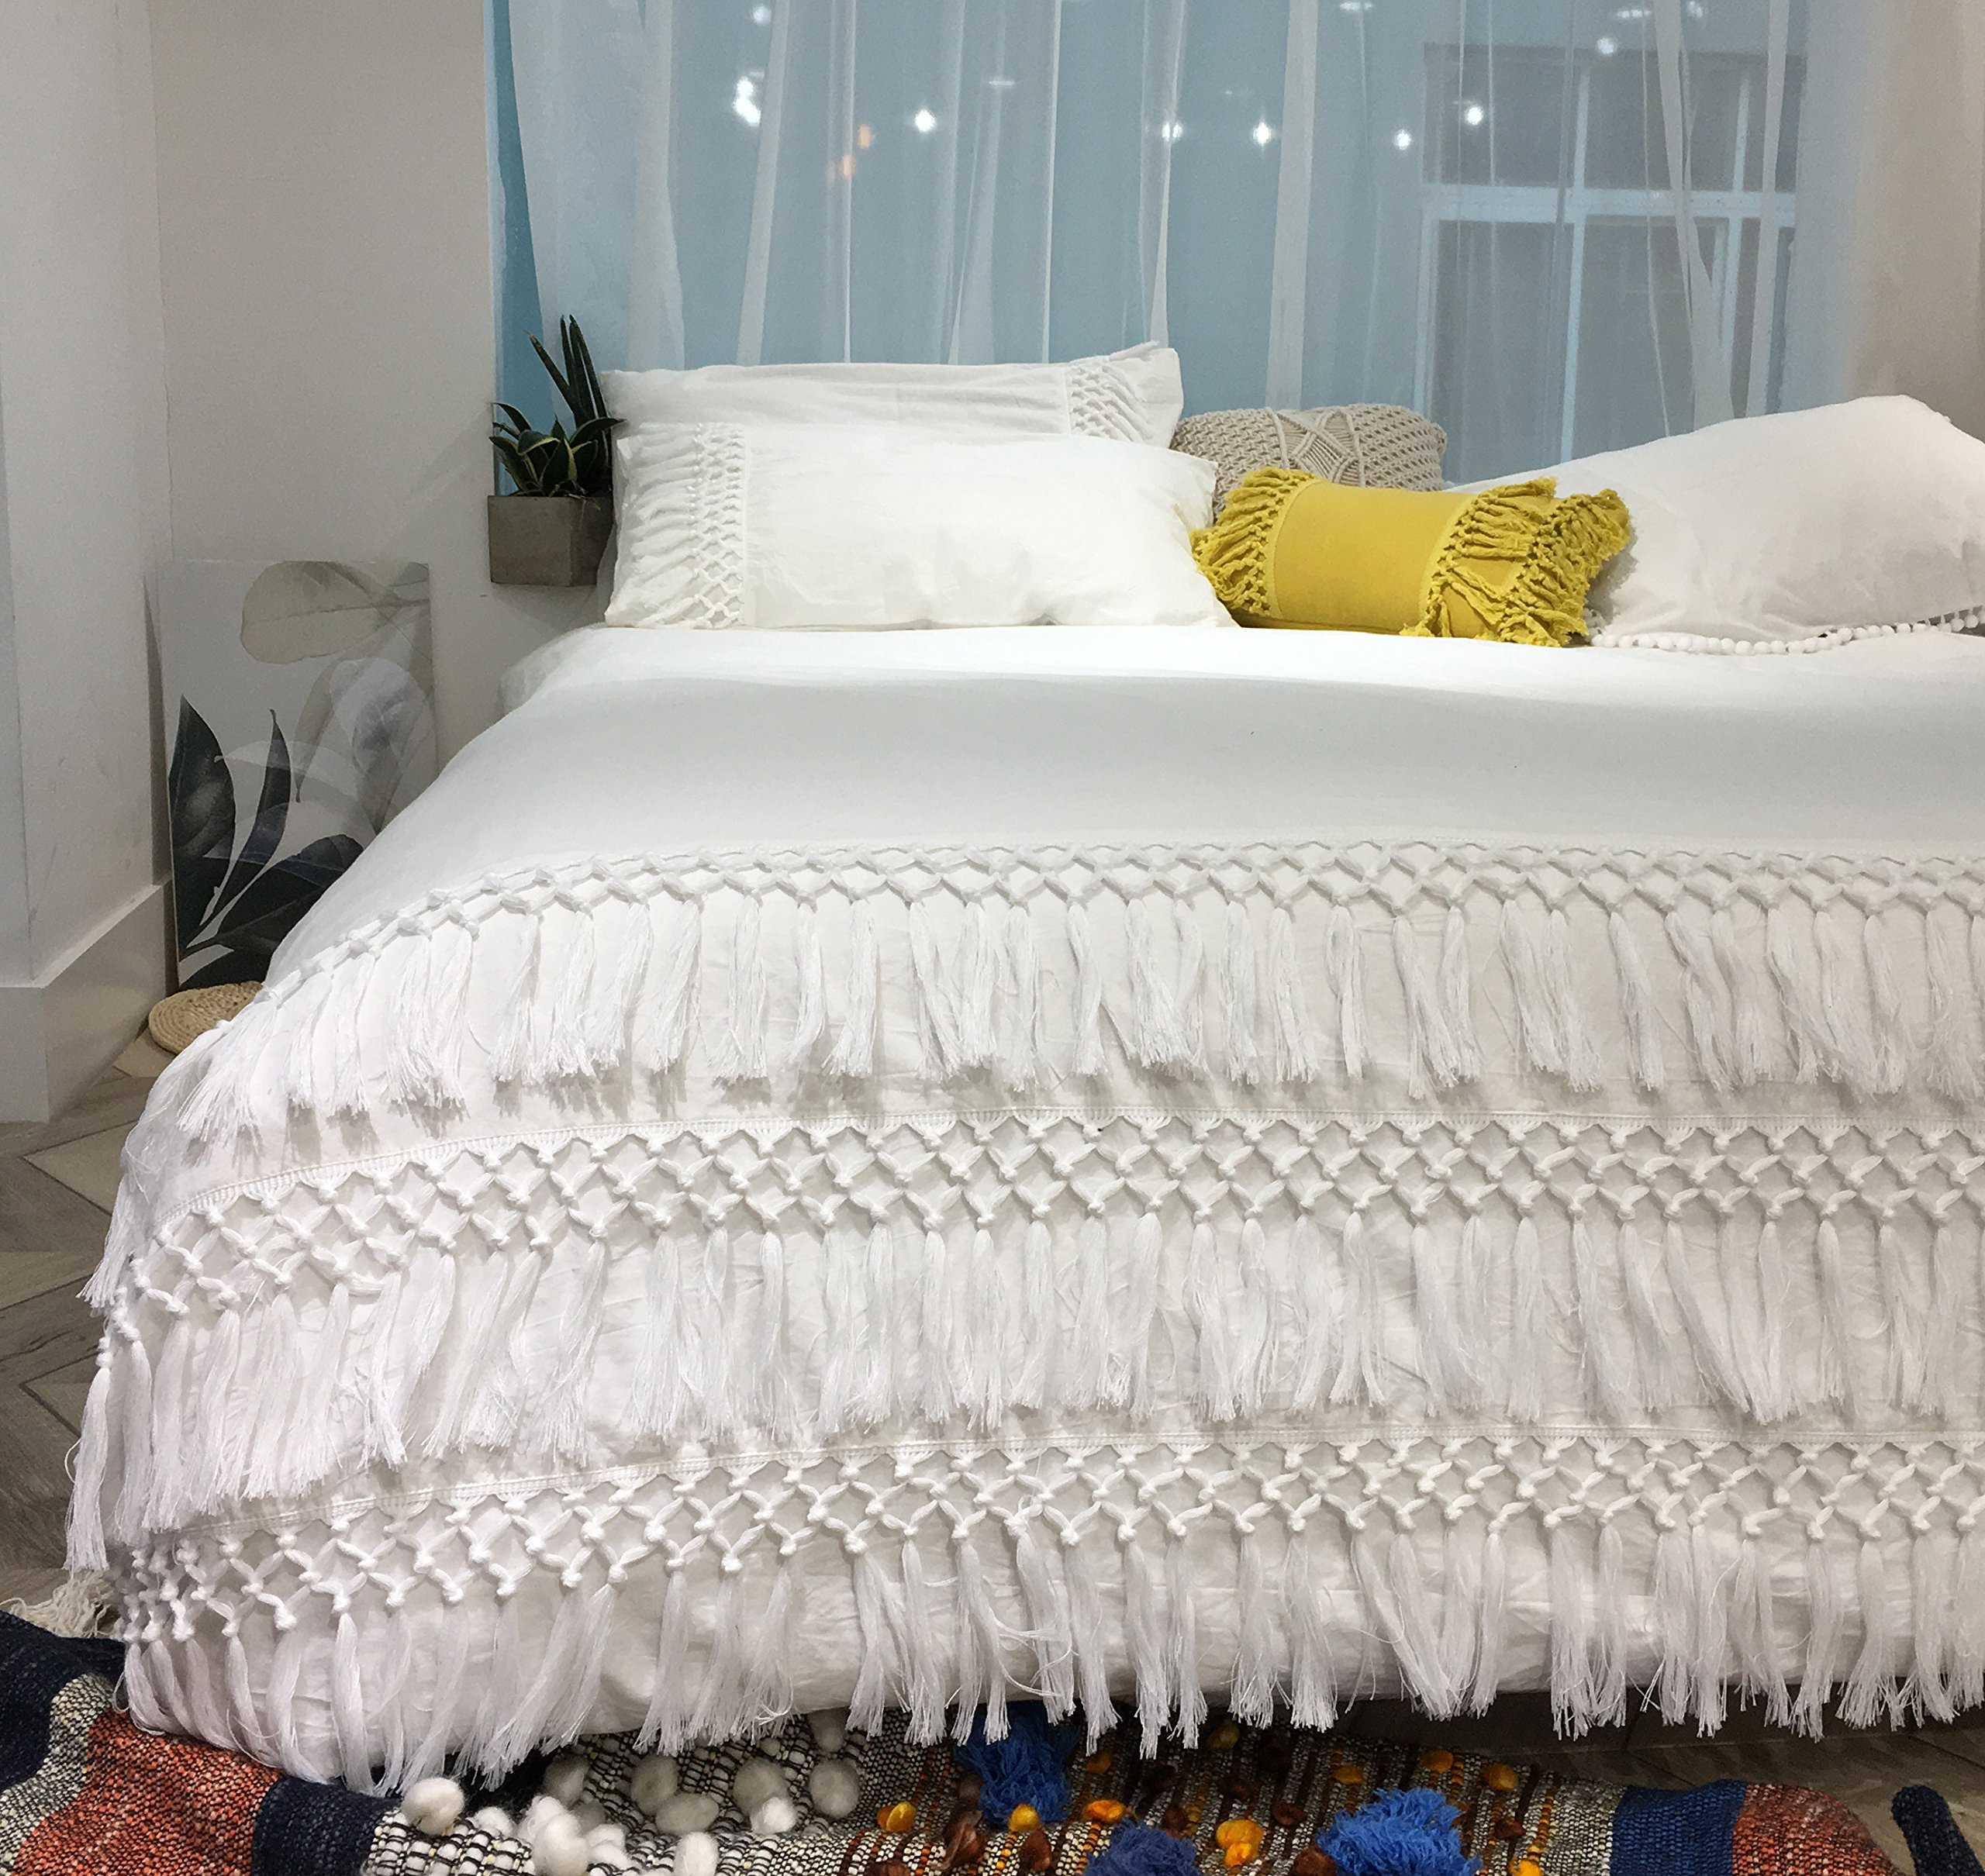 White Cotton Tassel Duvet Coverfull Queen86inx90in 614405053419 Ebay